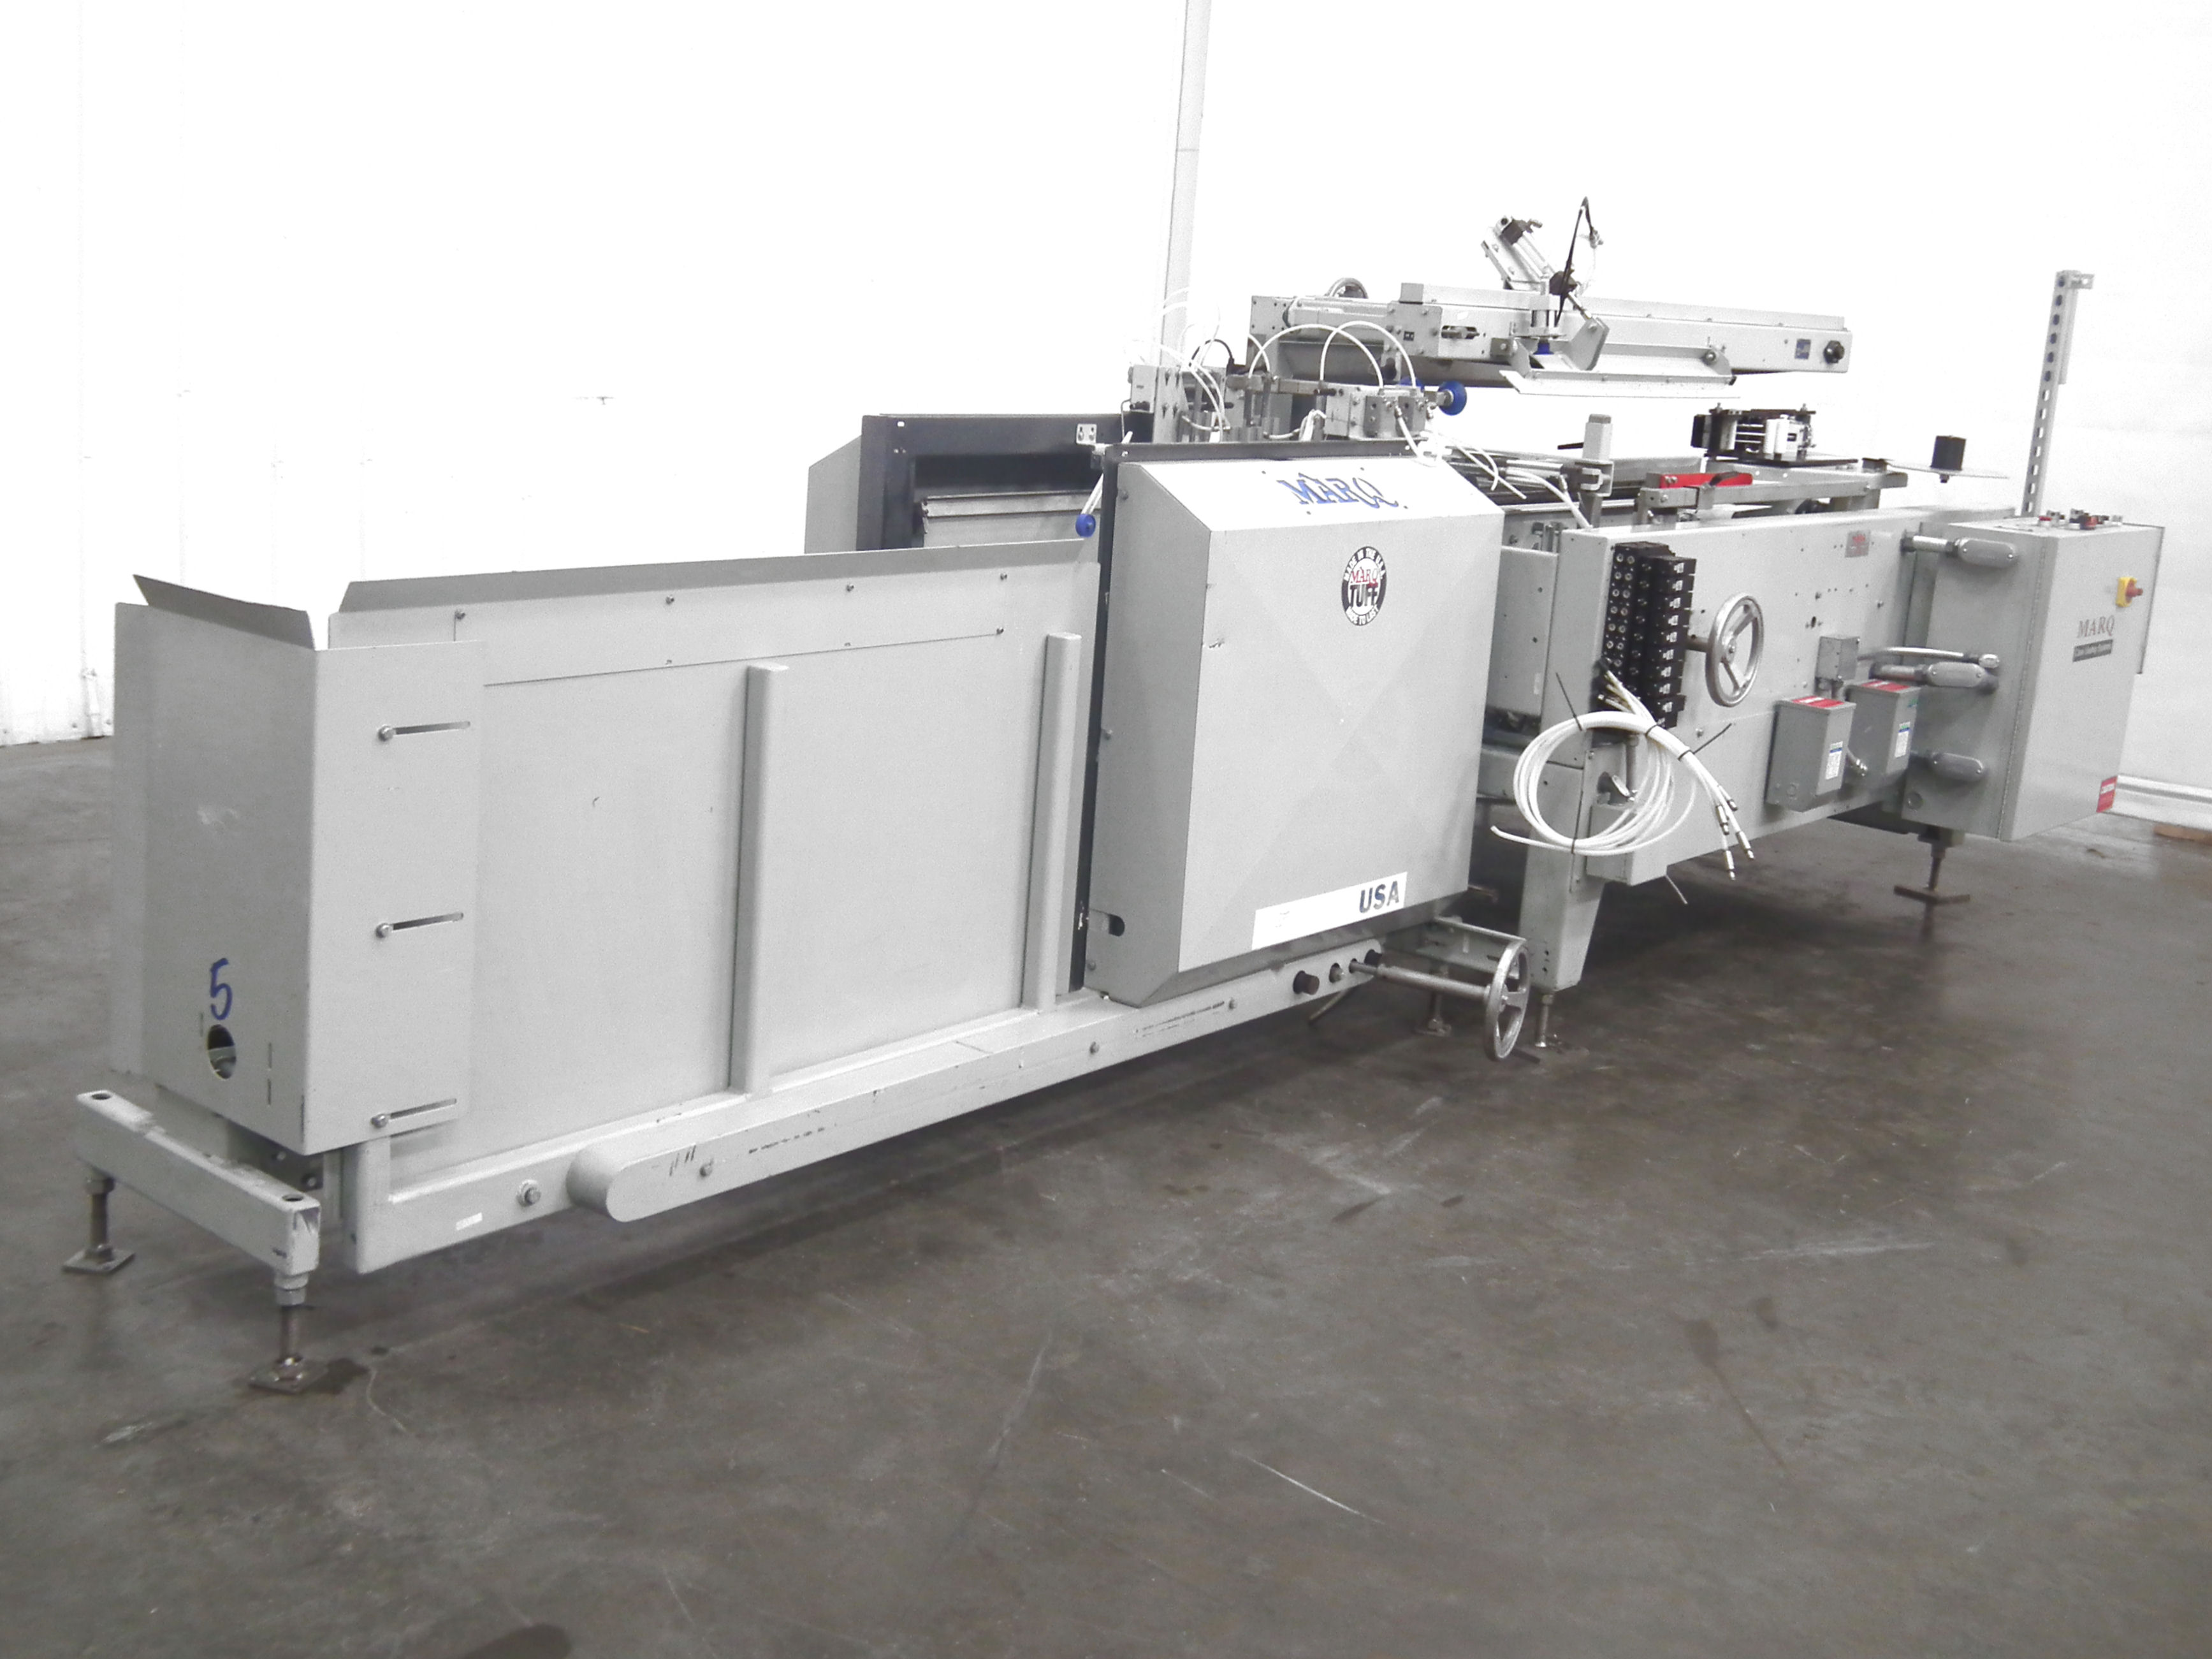 Marq Tuff HPE-NS-MF/RH/DL Bottom Tape Case Erector A9697 - Image 3 of 15